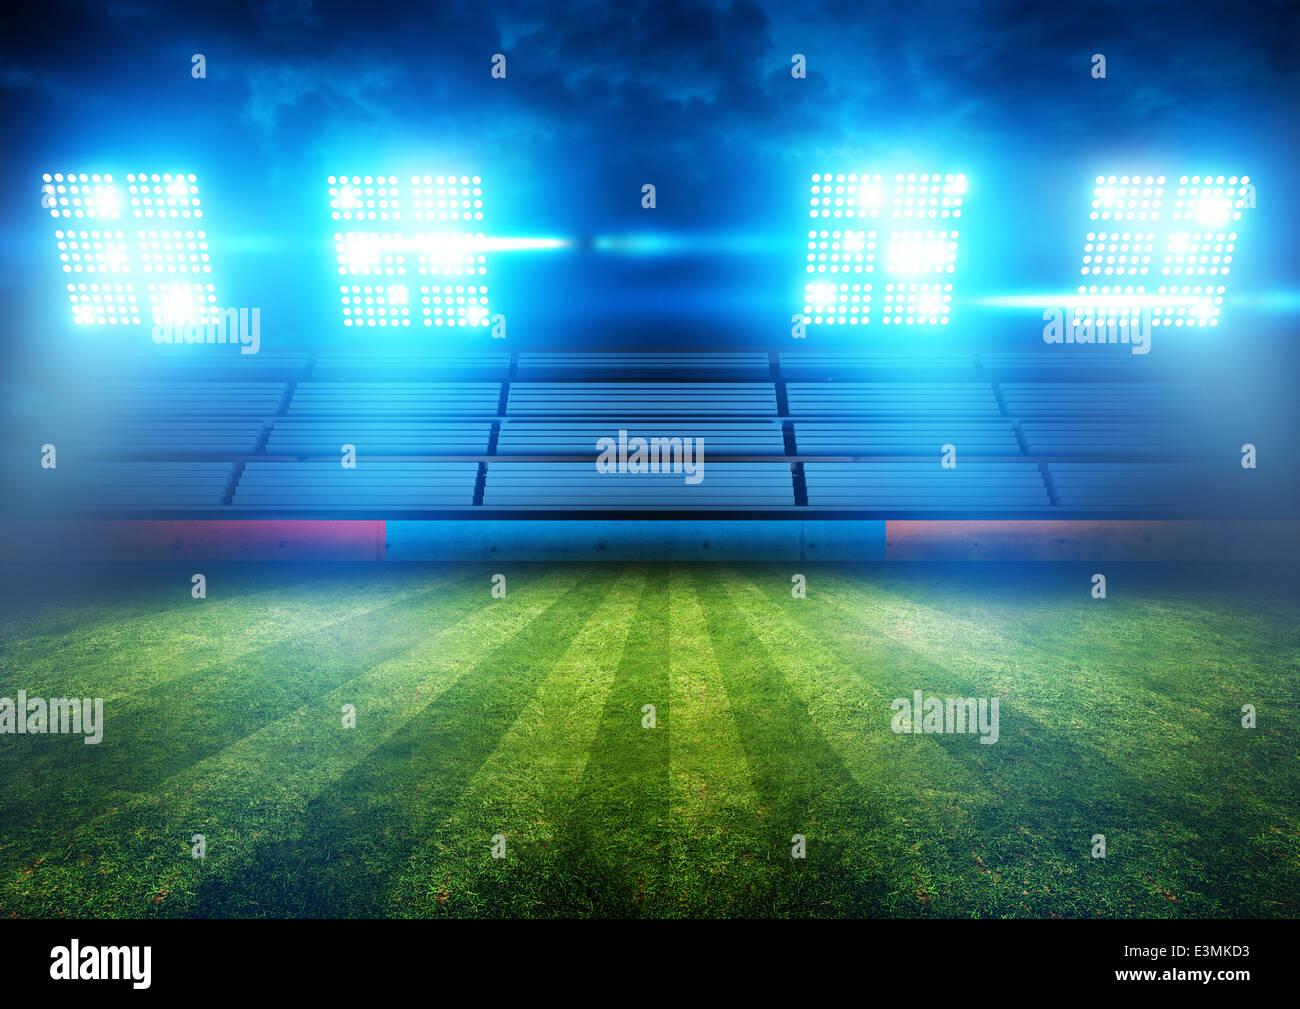 Football stadium lights art